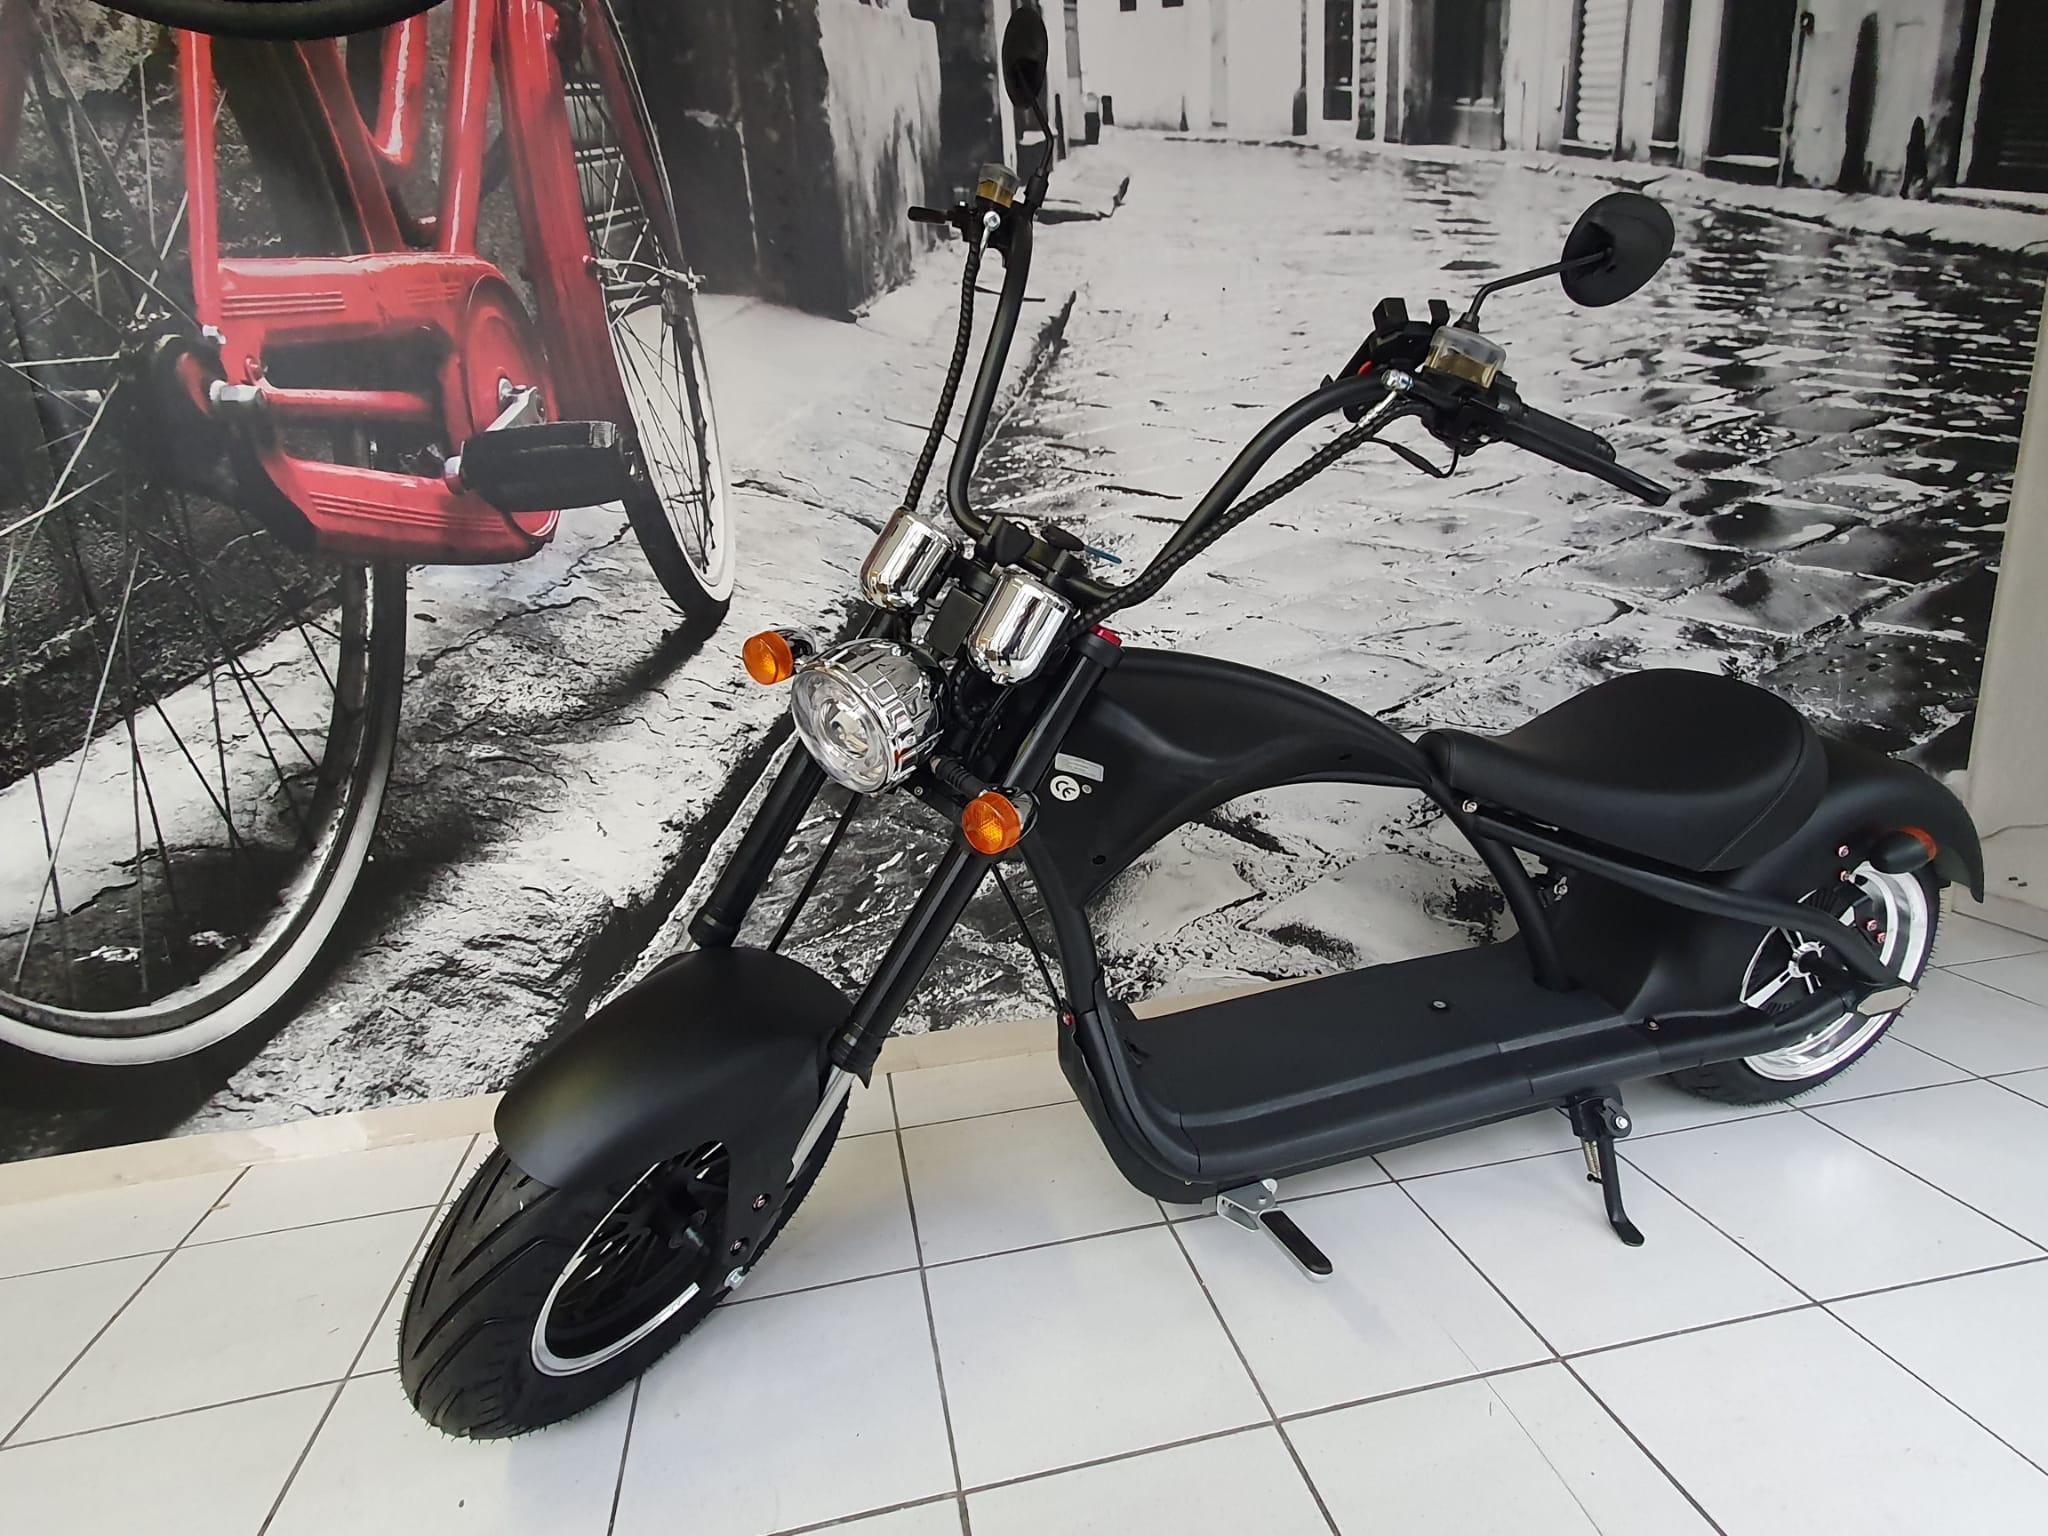 Elektroroller E-Scooter Harley Chopper 45km/h mit Fahrzeugausweis